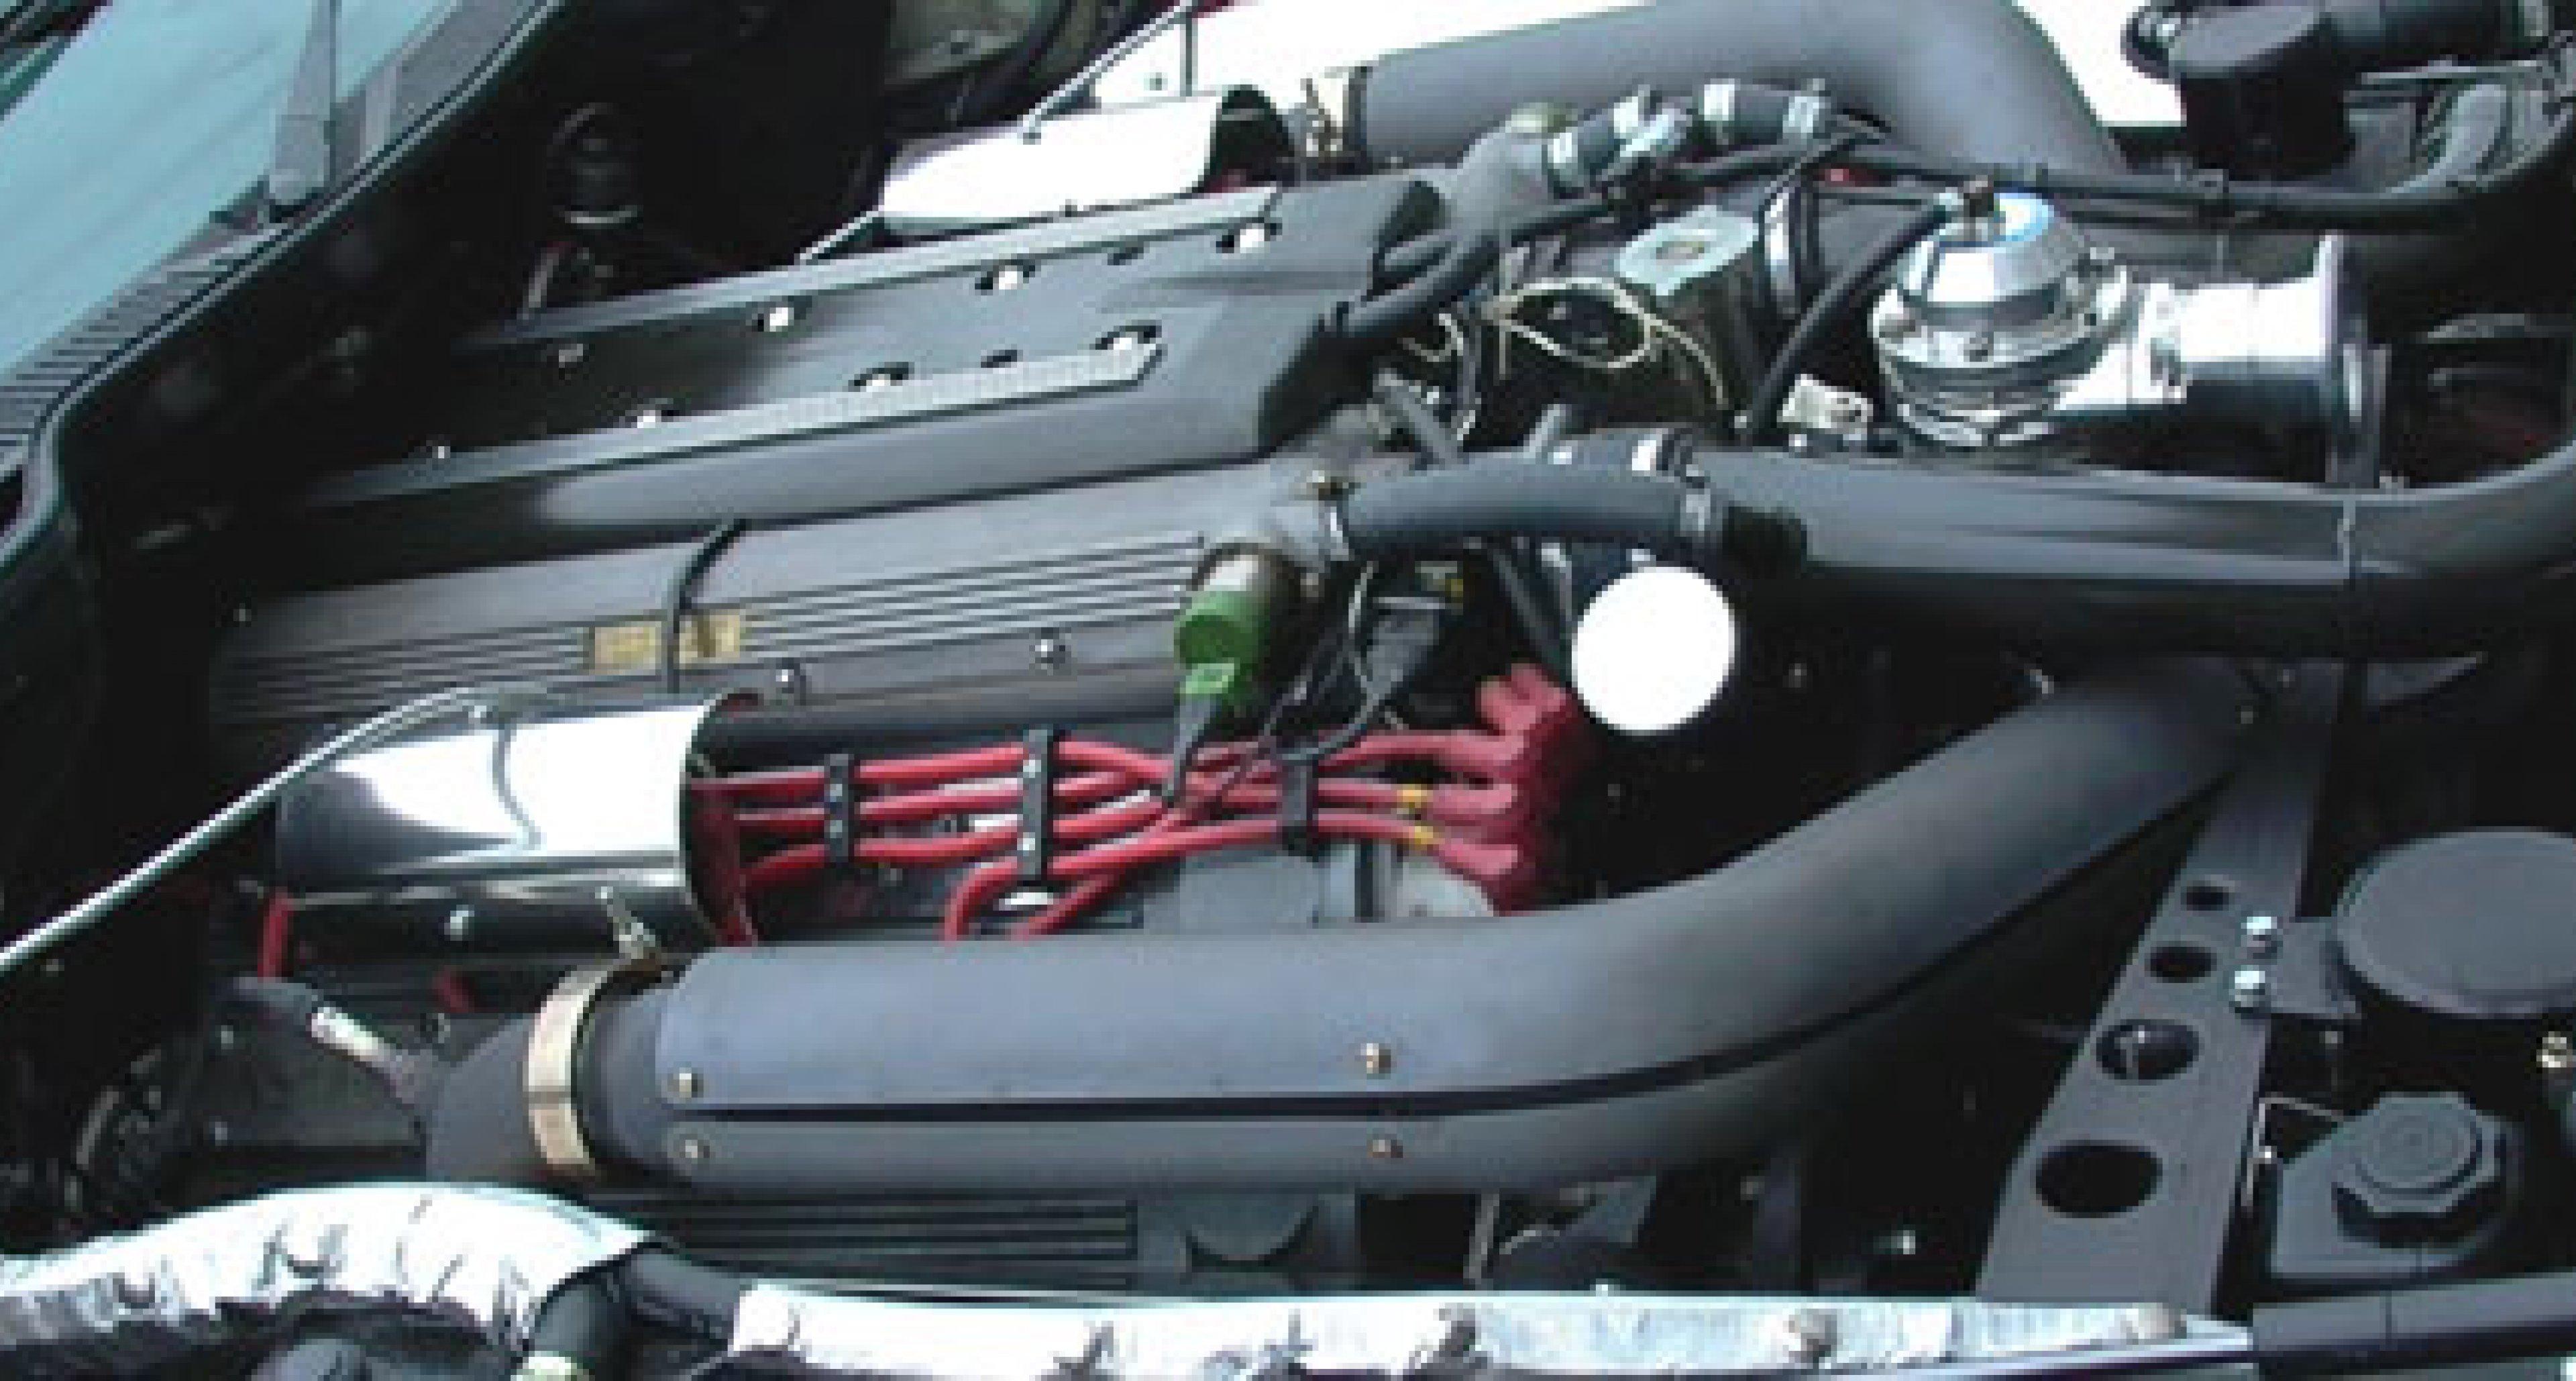 Lynx Aston Martin Virage Turbo